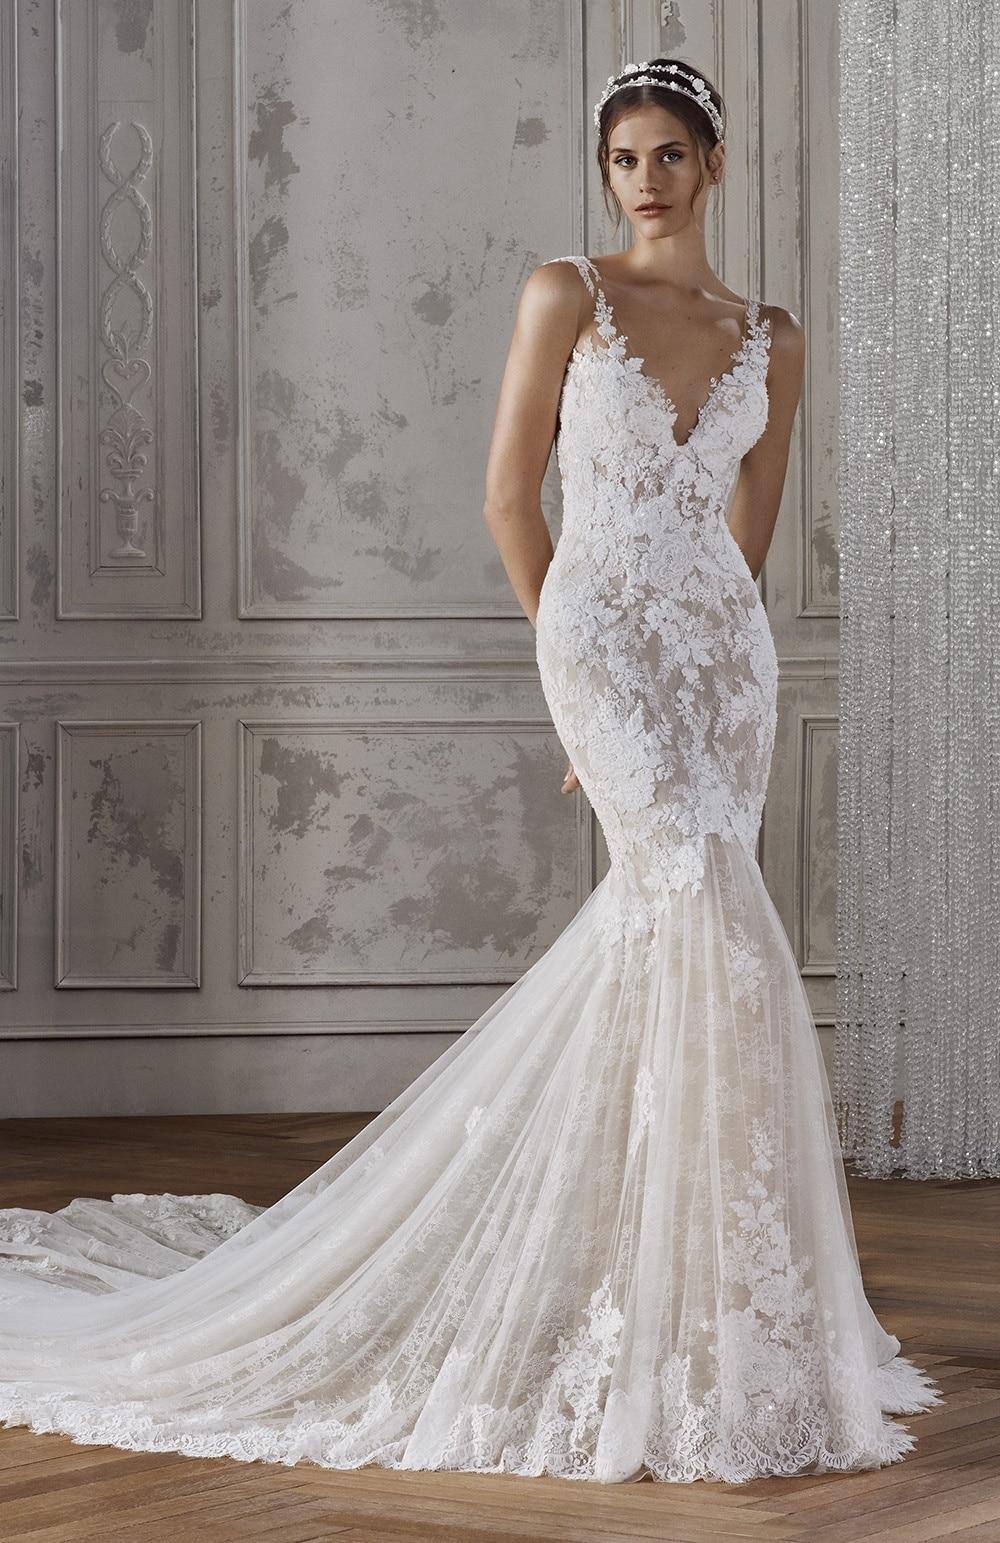 Robe de mariée Modèle Kalania